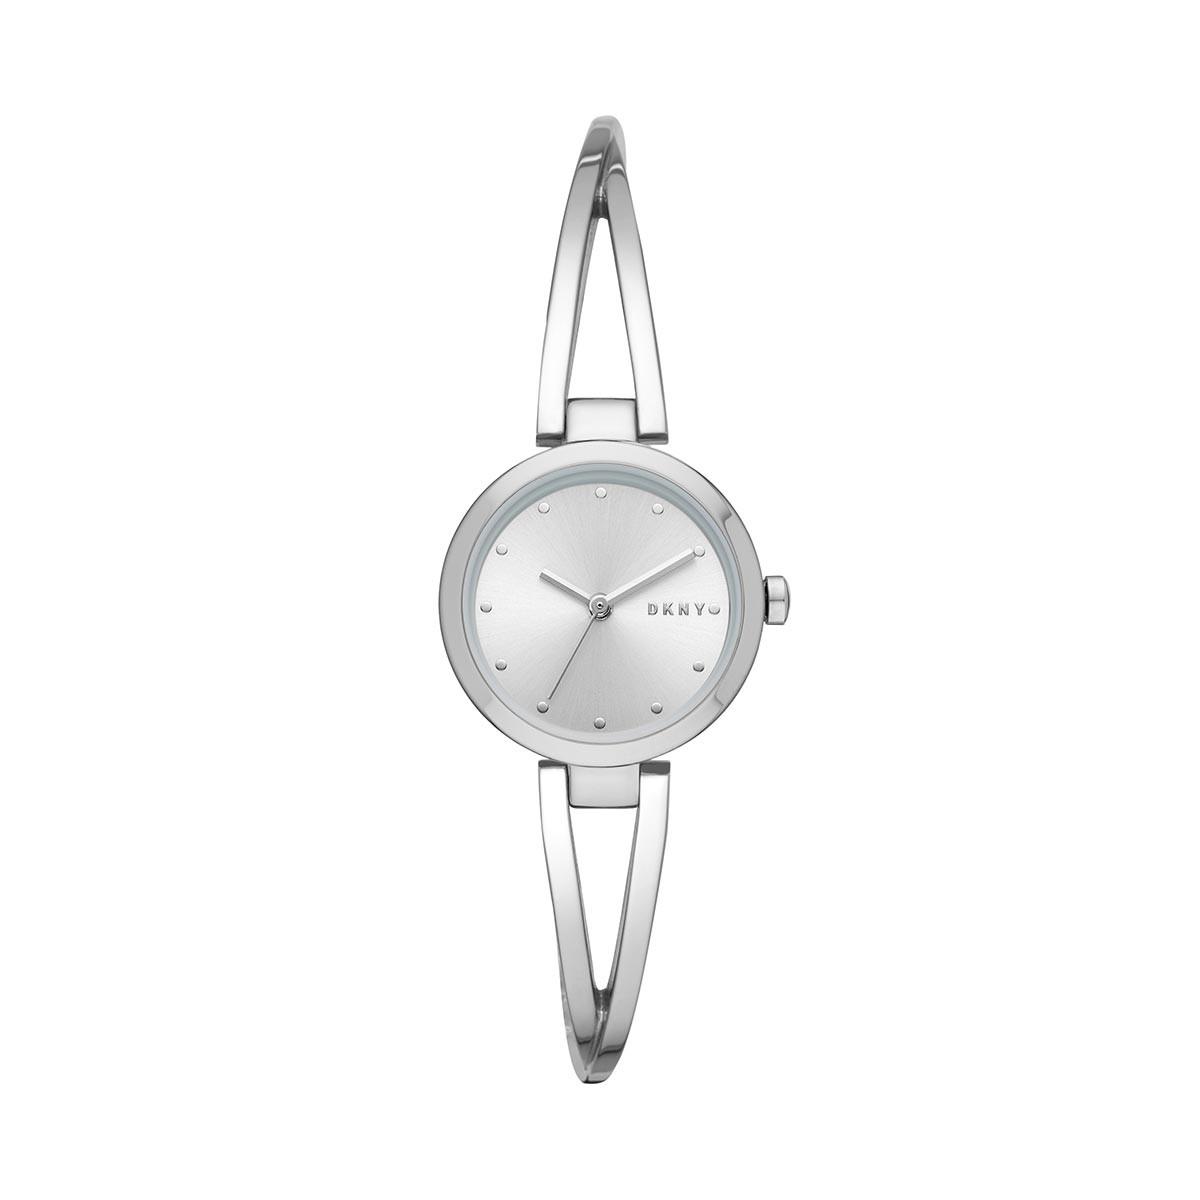 DKNY Uhr - NY2789 Crosswalk Watch Silver - in silber - für Damen